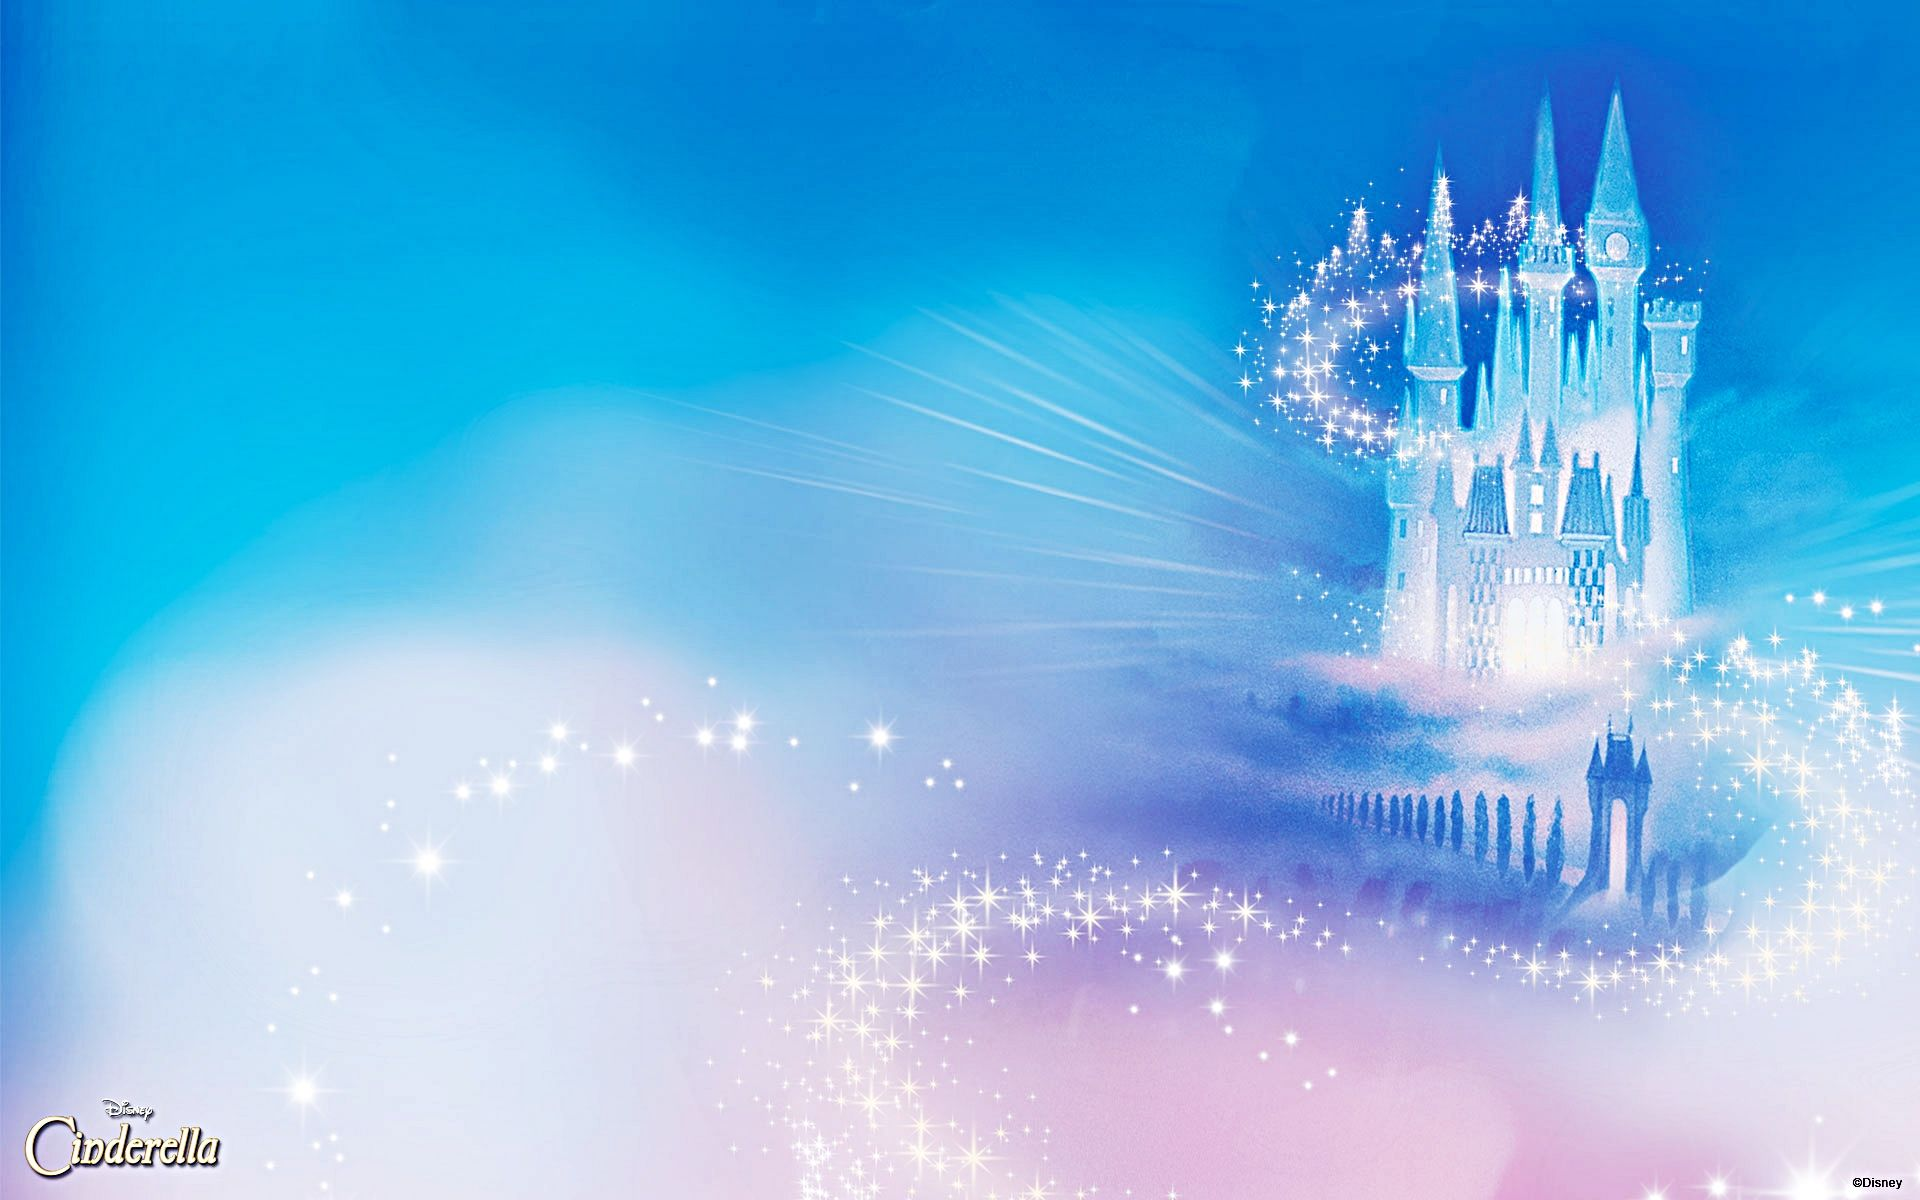 Disney Cinderella Castle Disney World Resorts Disney Cinderella Castle Disney Trips